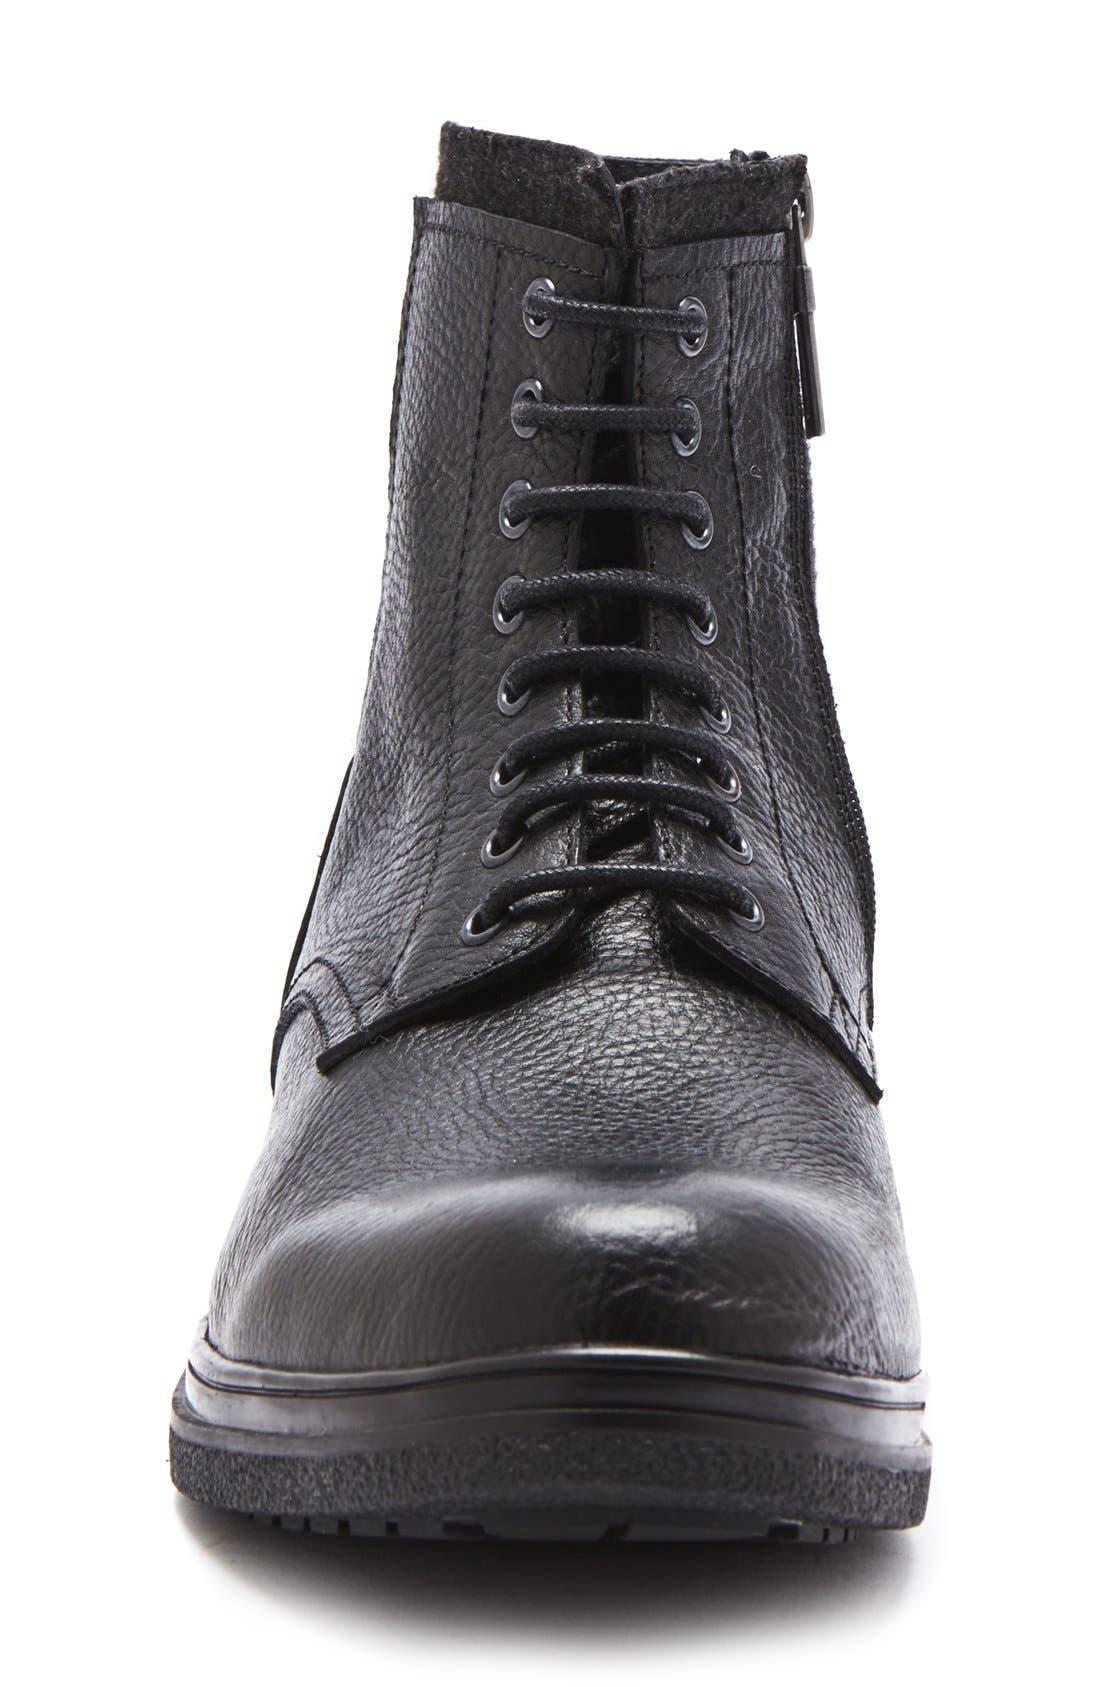 'Backoff' Waterproof Plain Toe Boot,                             Alternate thumbnail 3, color,                             Black Leather